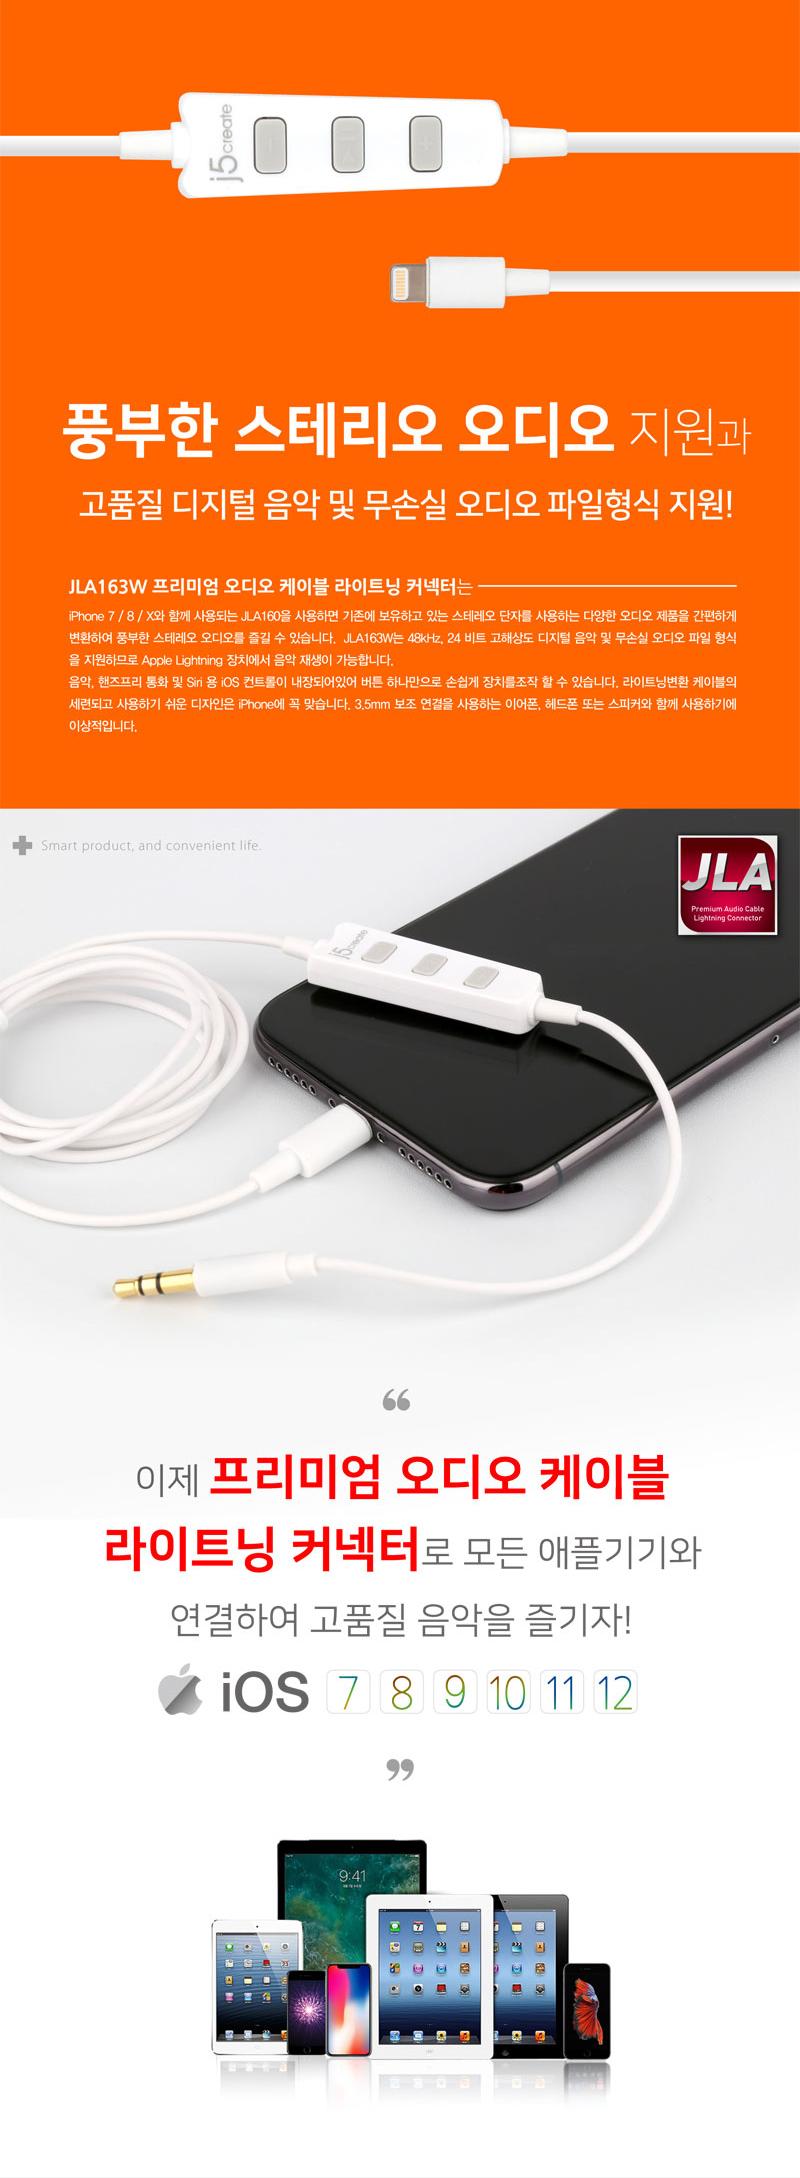 j5create  프리미엄 오디오 케이블 라이트닝 커넥터 (JLA163W)(1m)